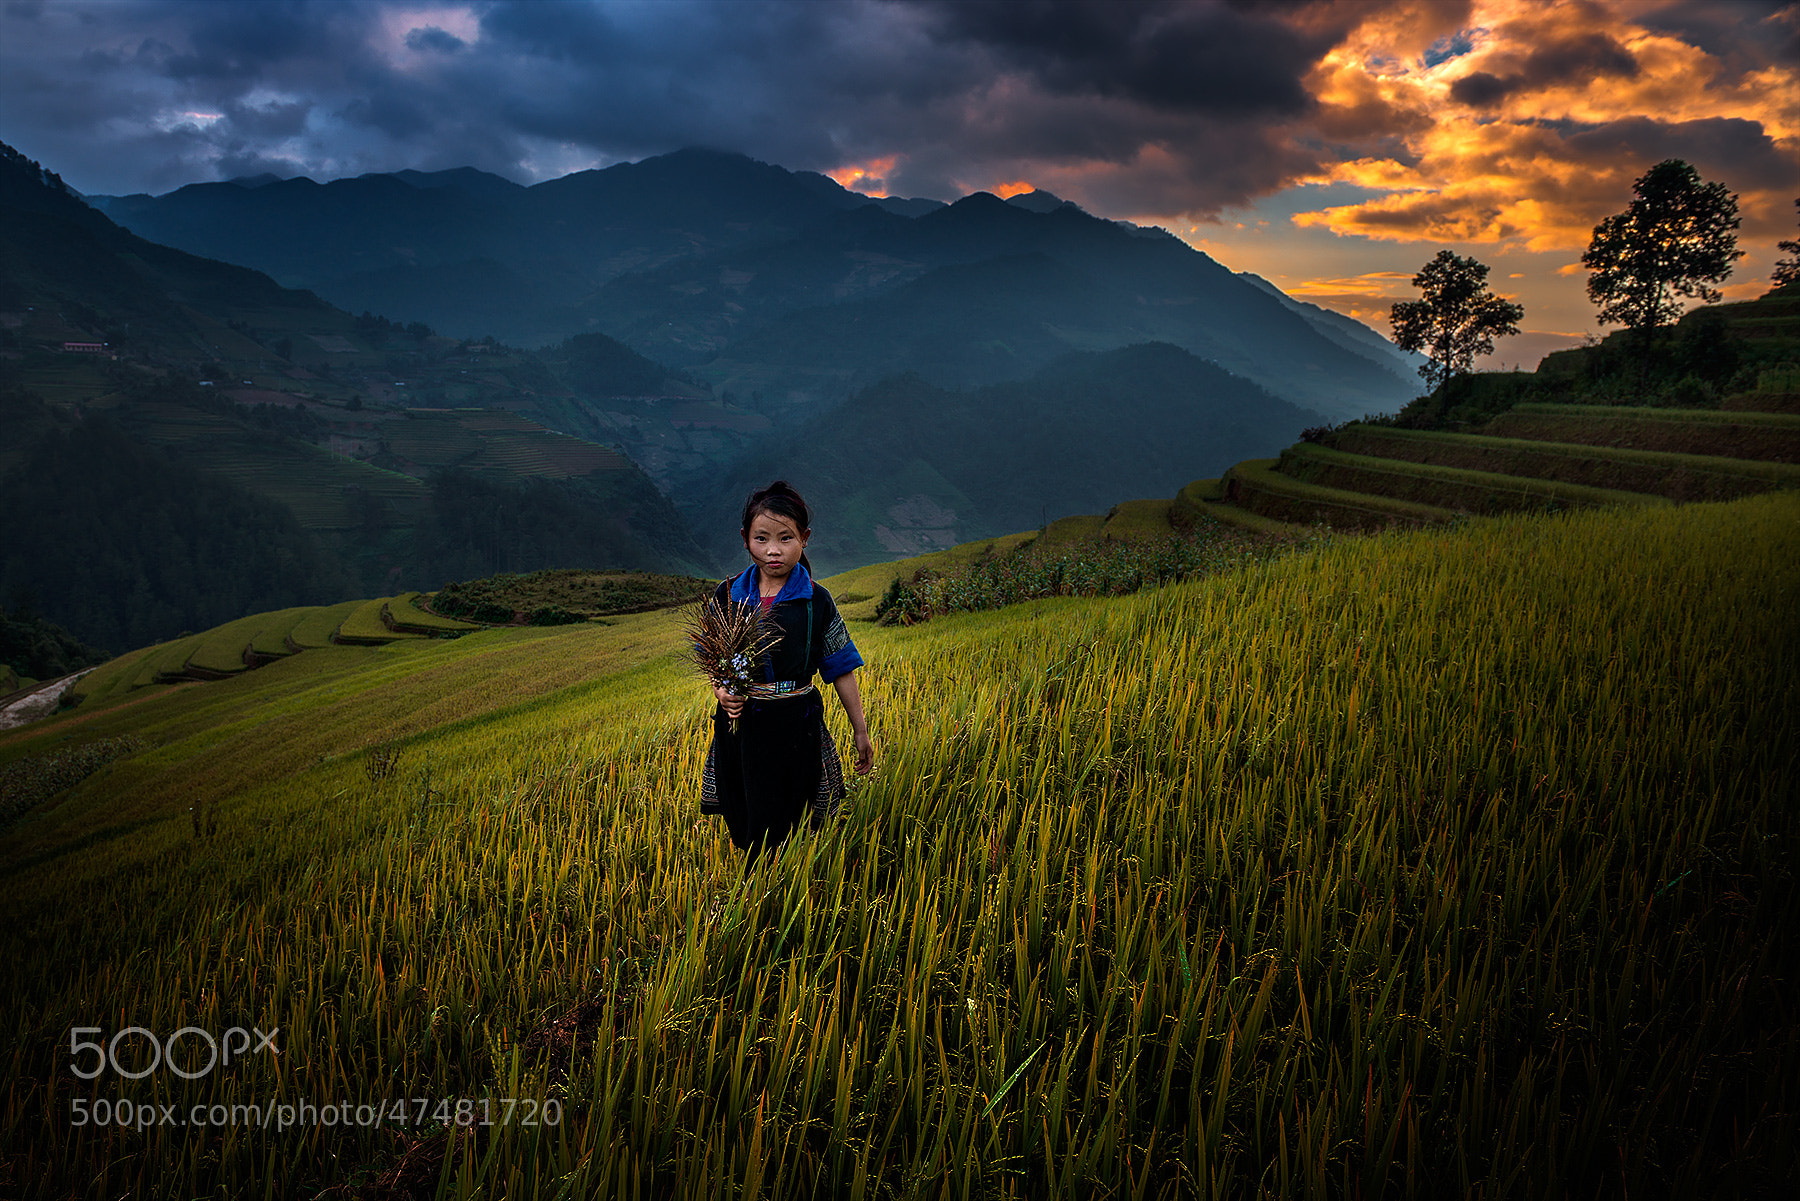 Photograph People in Mu Cang Chai by Ratnakorn Piyasirisorost on 500px